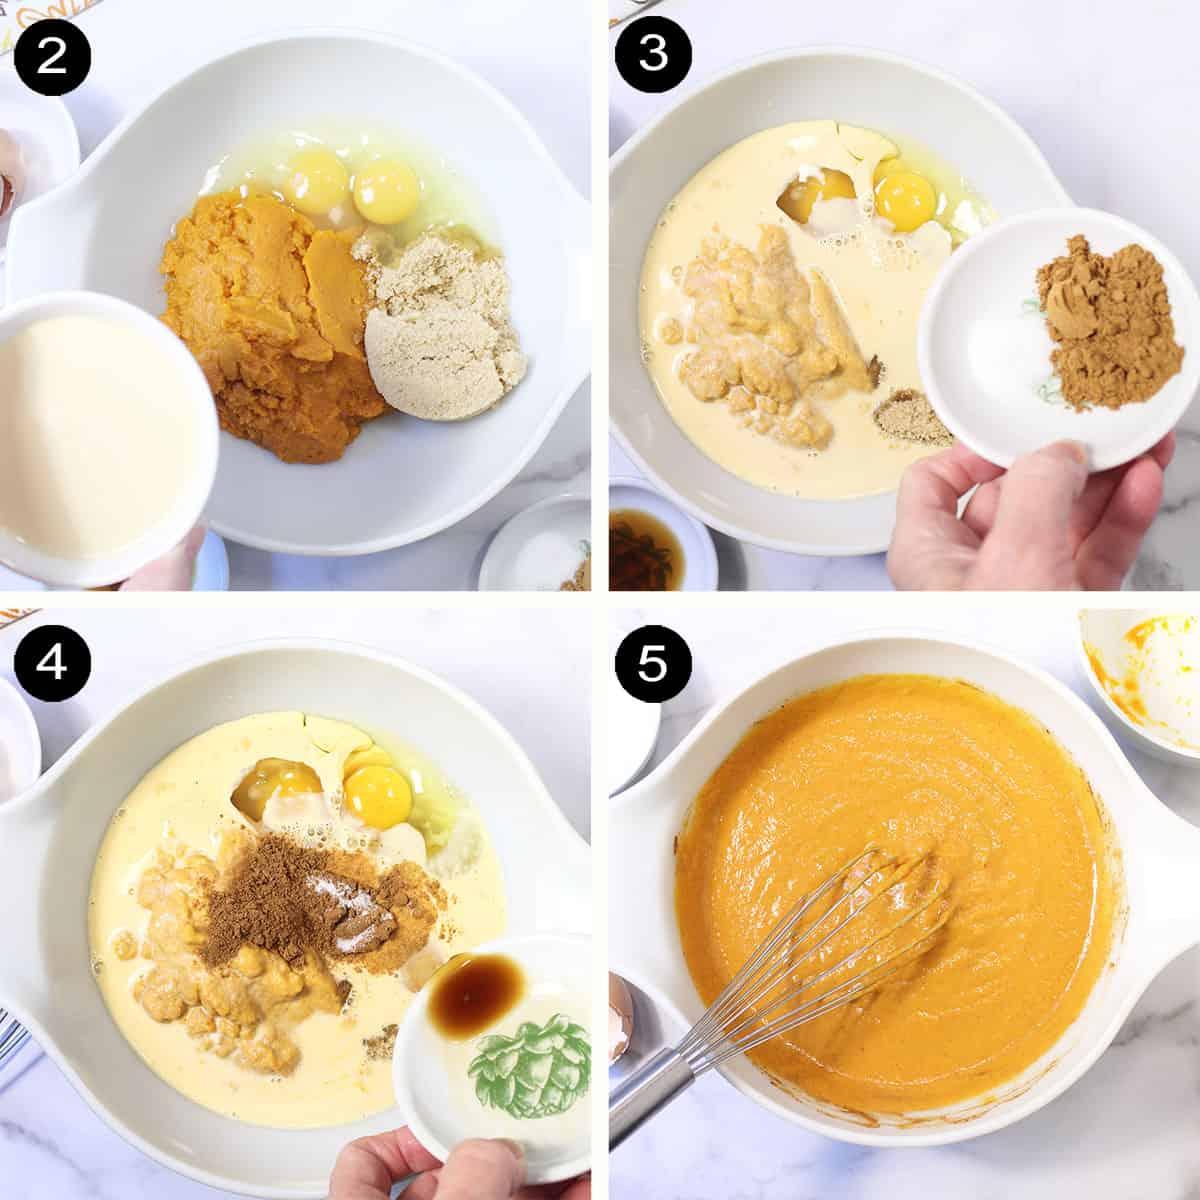 Steps to make pumpkin layer.